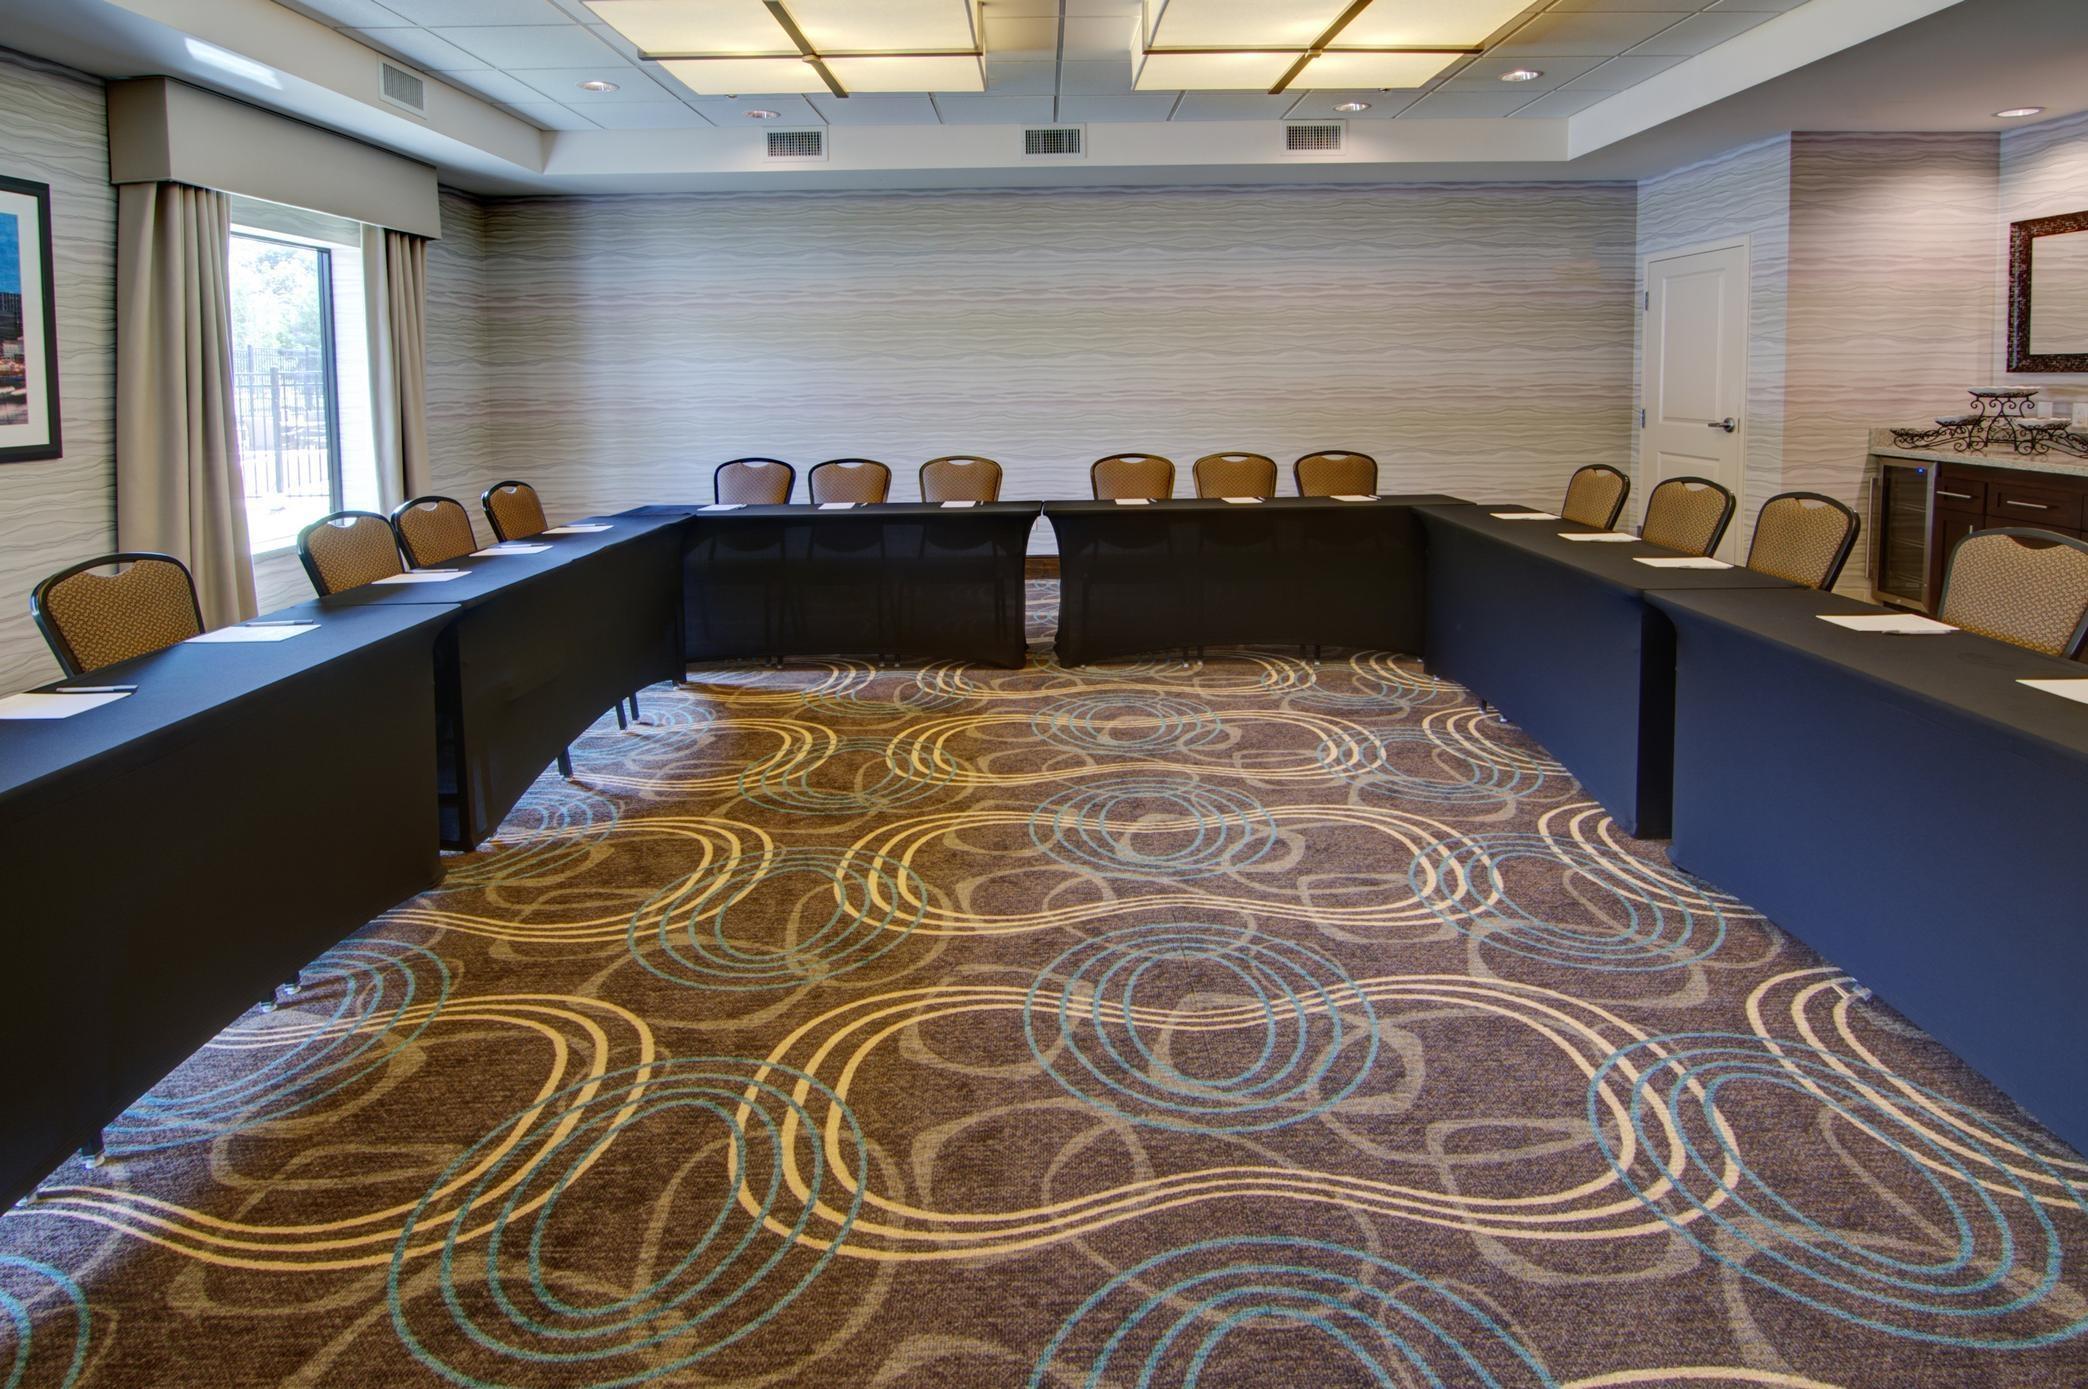 Hampton Inn & Suites Trophy Club - Fort Worth North image 12